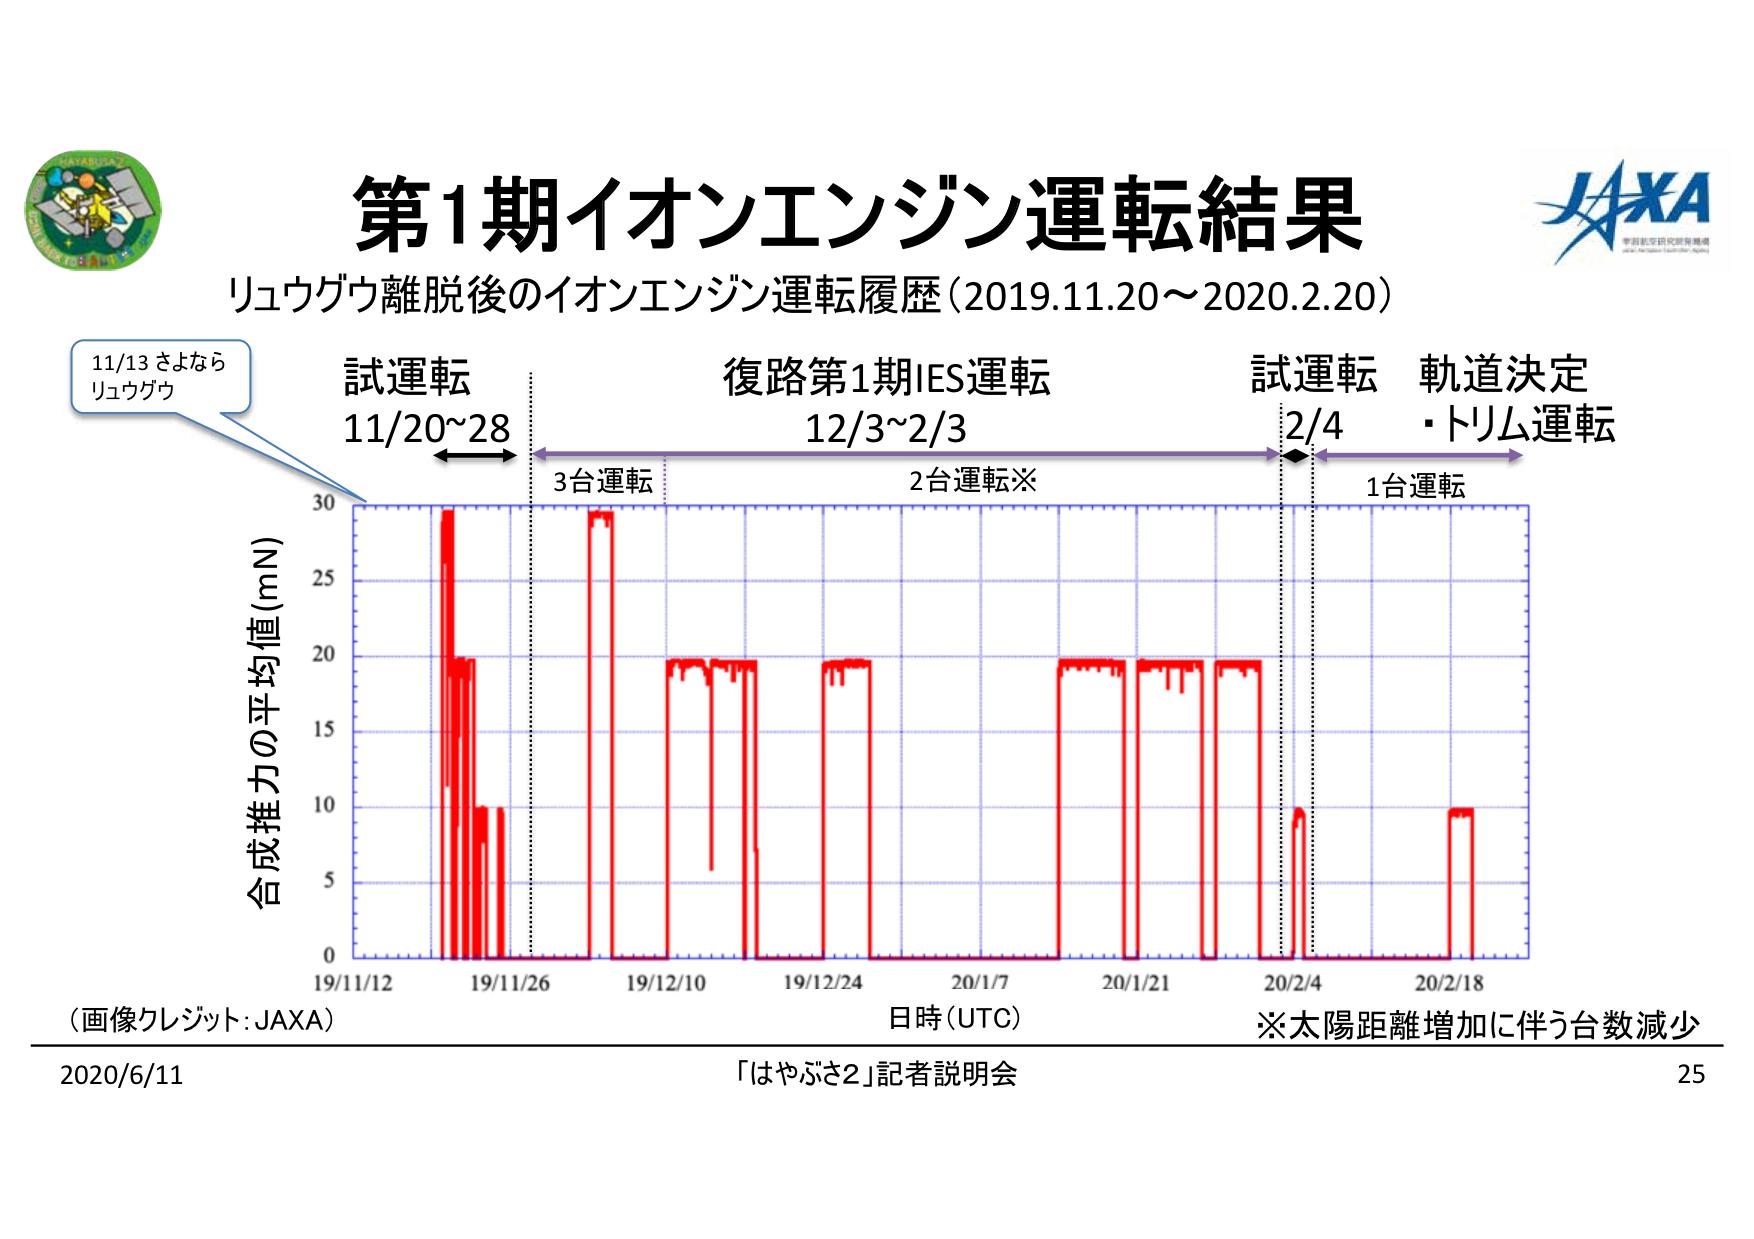 f:id:Imamura:20200611094719p:plain